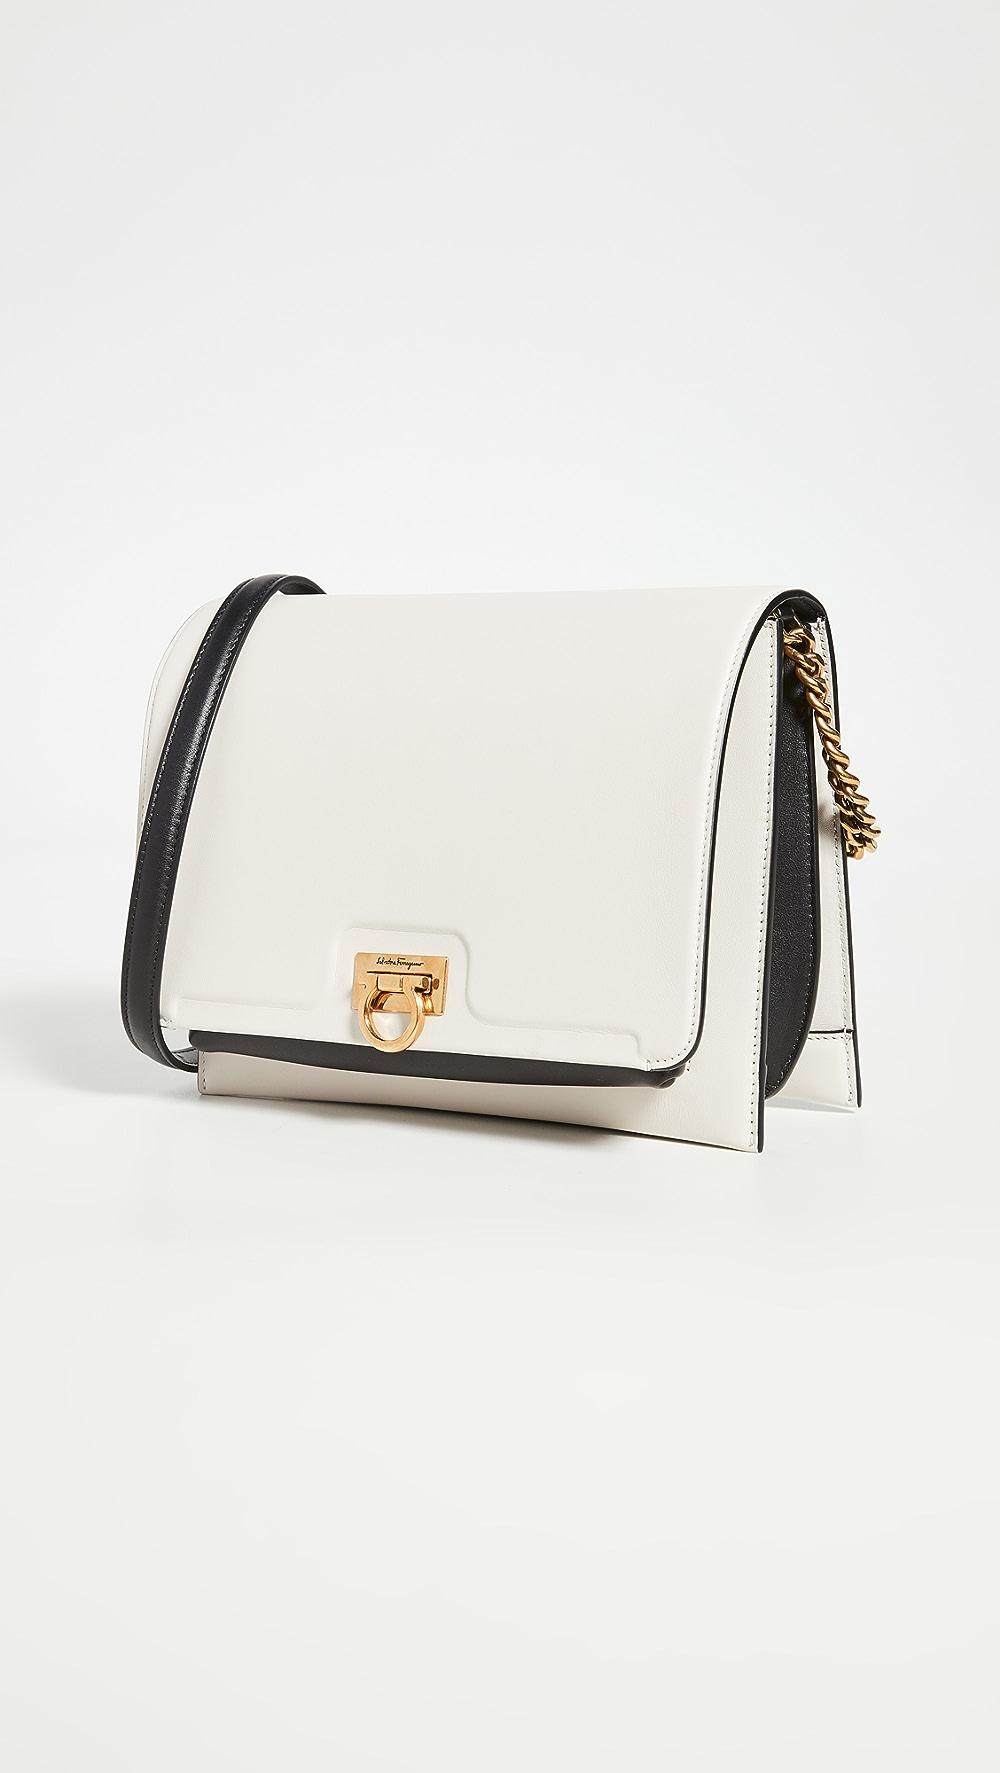 Rational Salvatore Ferragamo - Gancio Square Shoulder Bag A Wide Selection Of Colours And Designs